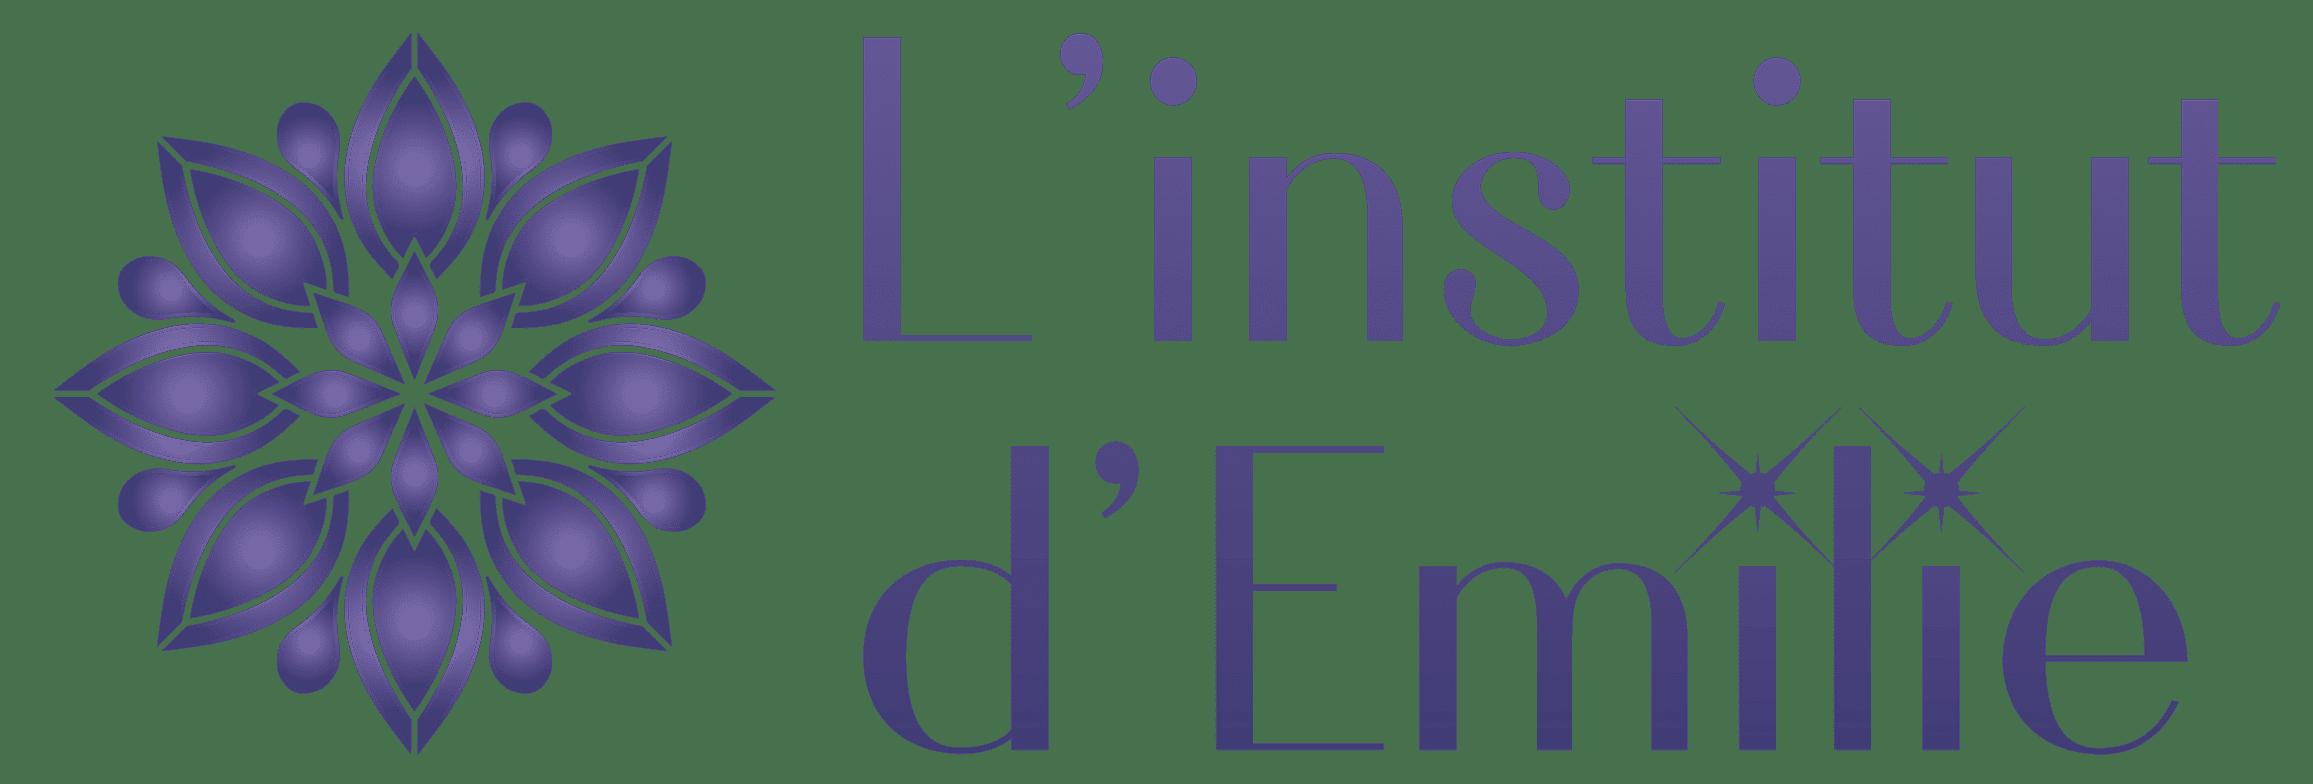 creation logo institut emilie SB-GRAPH aubagne marseille